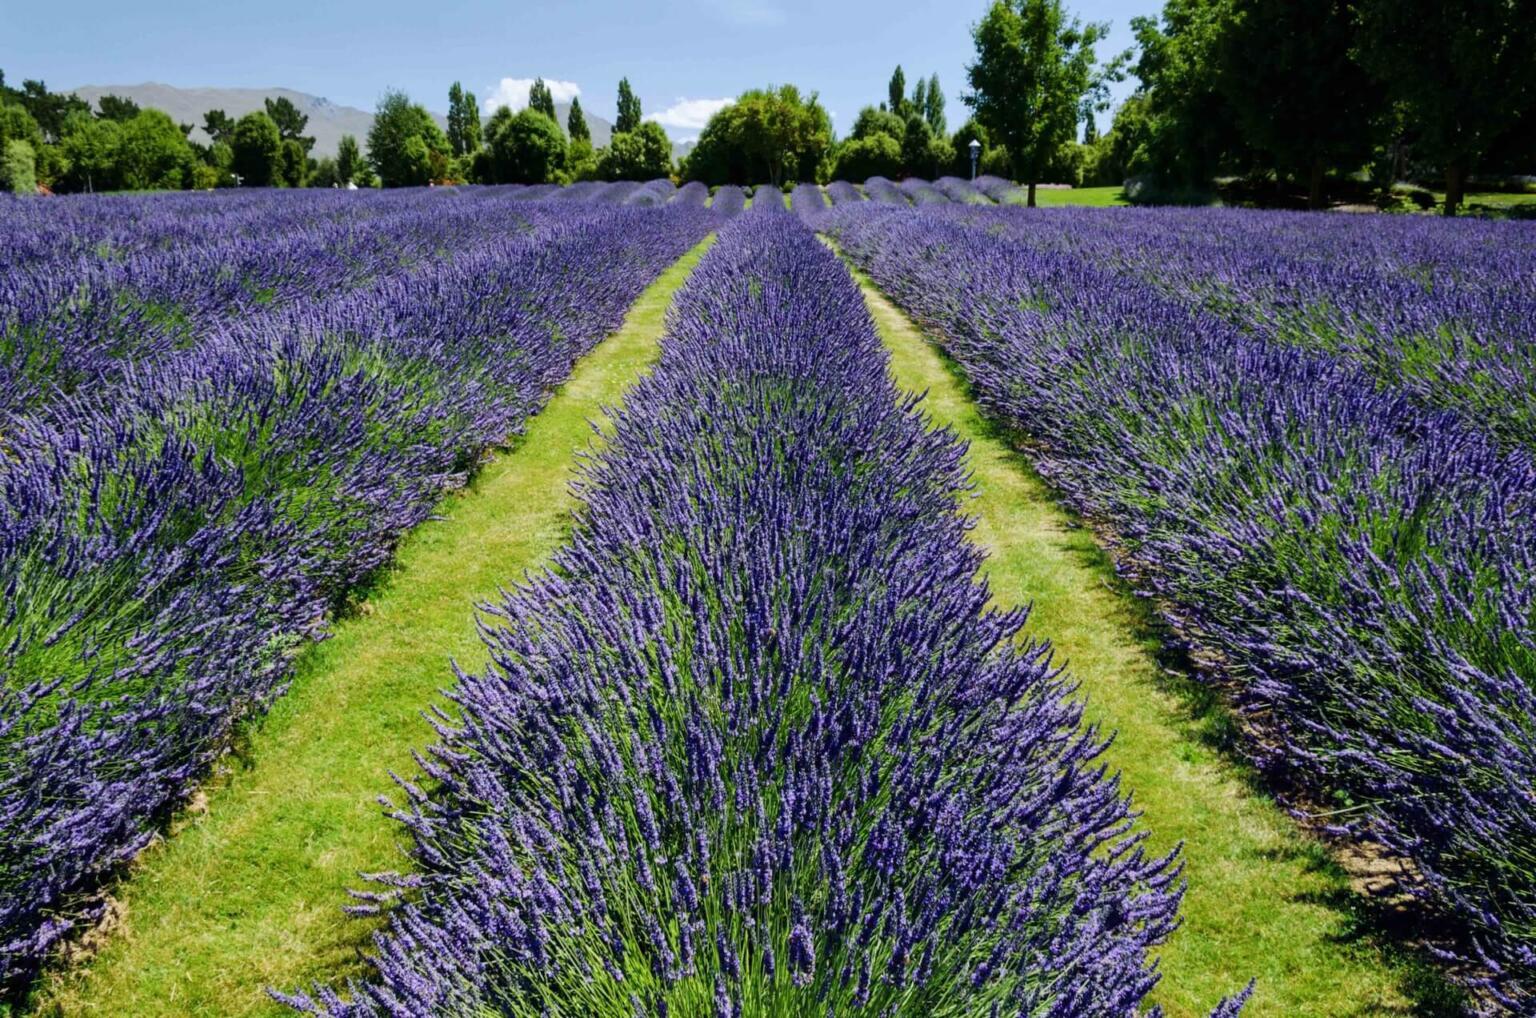 A lavendar farm in Wanaka, New Zealand